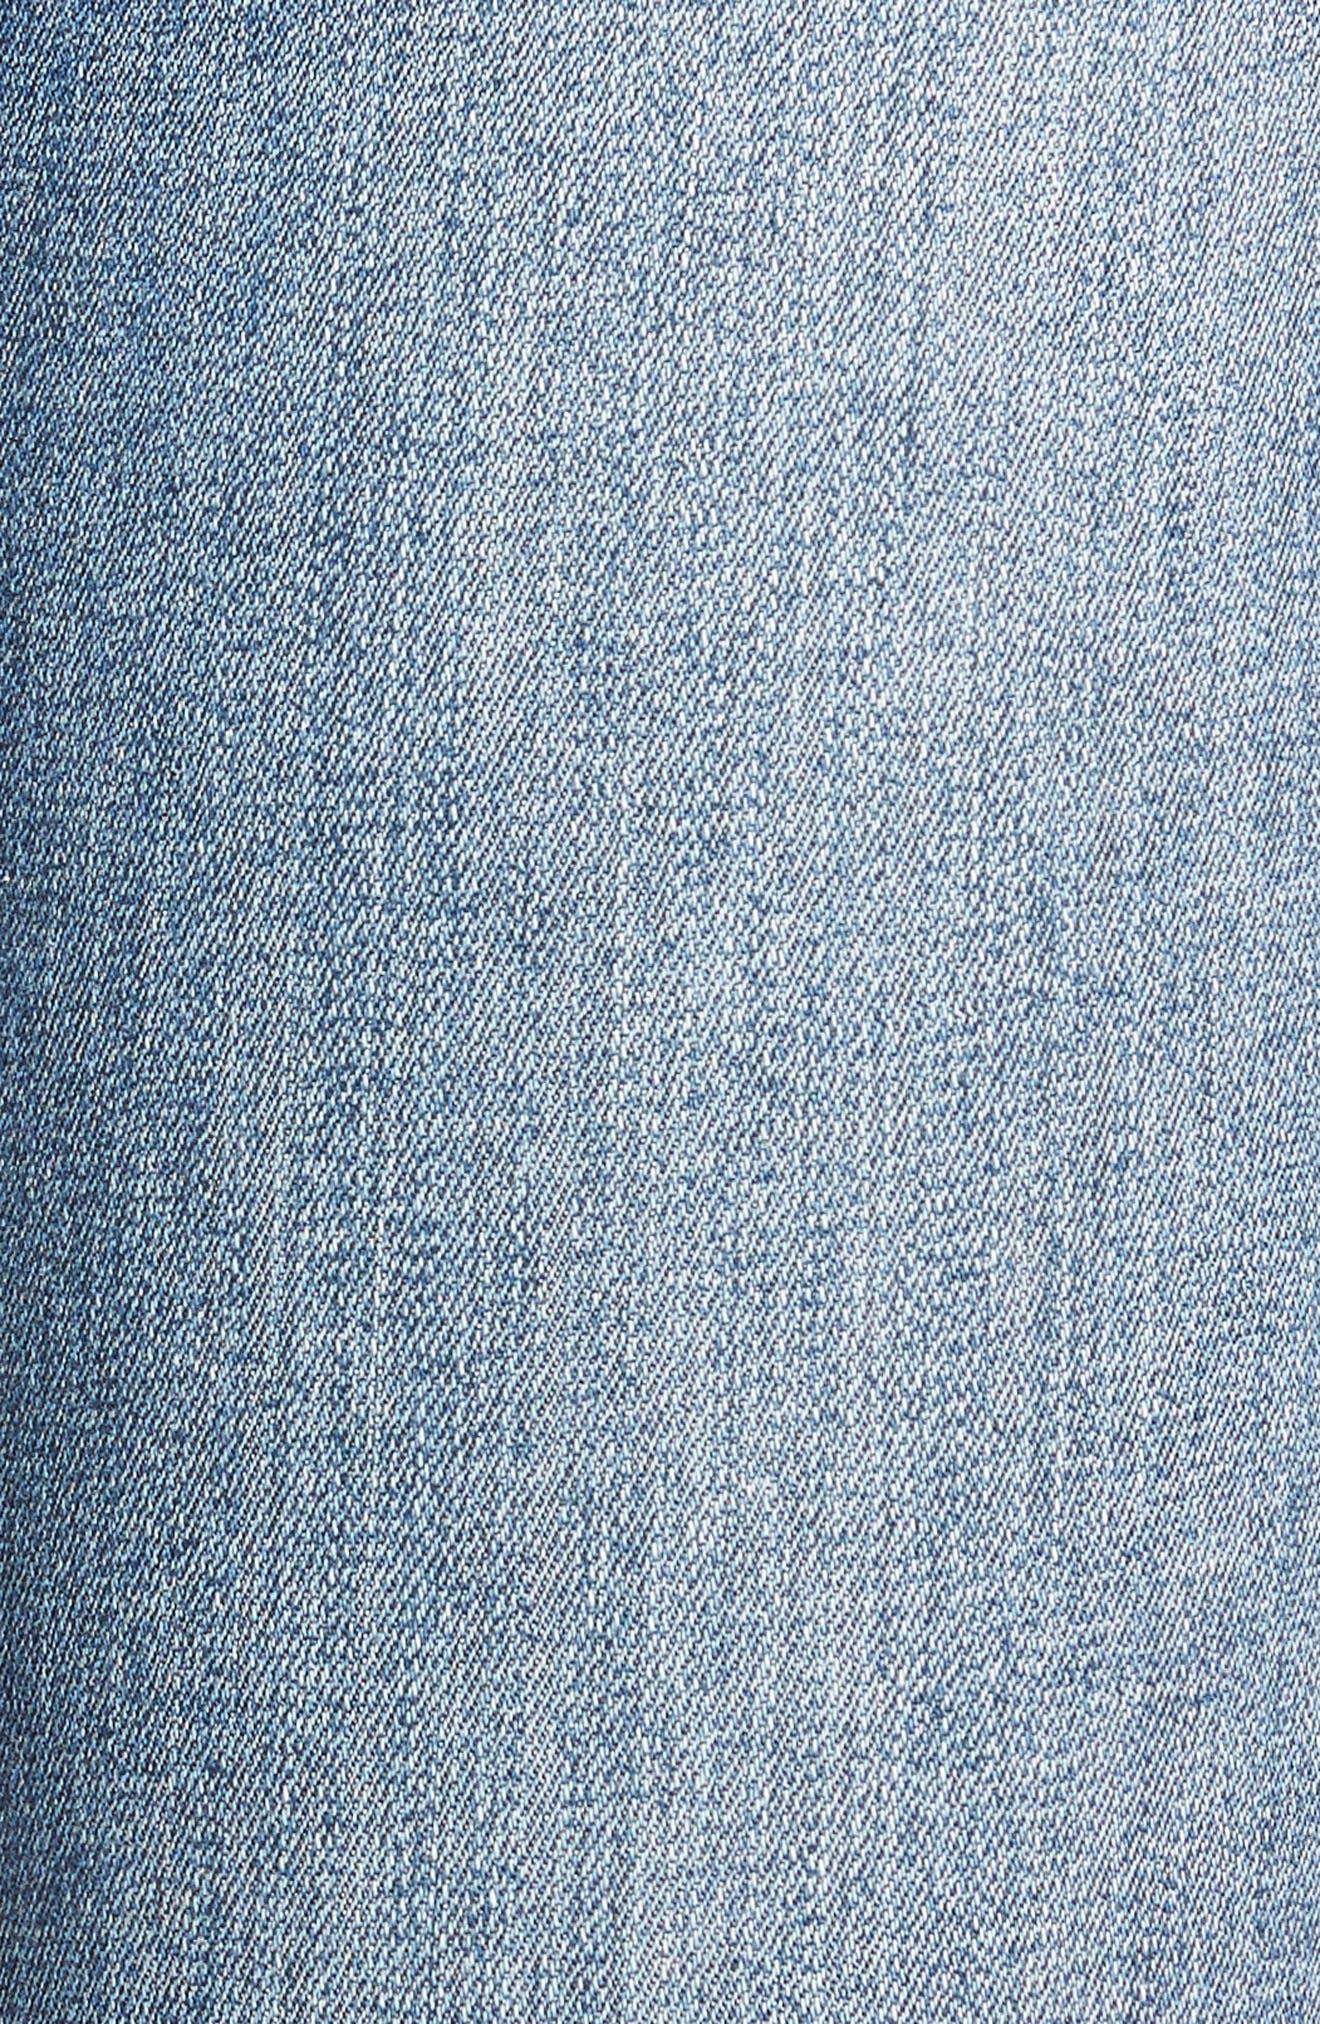 Decon Raw Edge High Waist Skinny Jeans,                             Alternate thumbnail 5, color,                             420